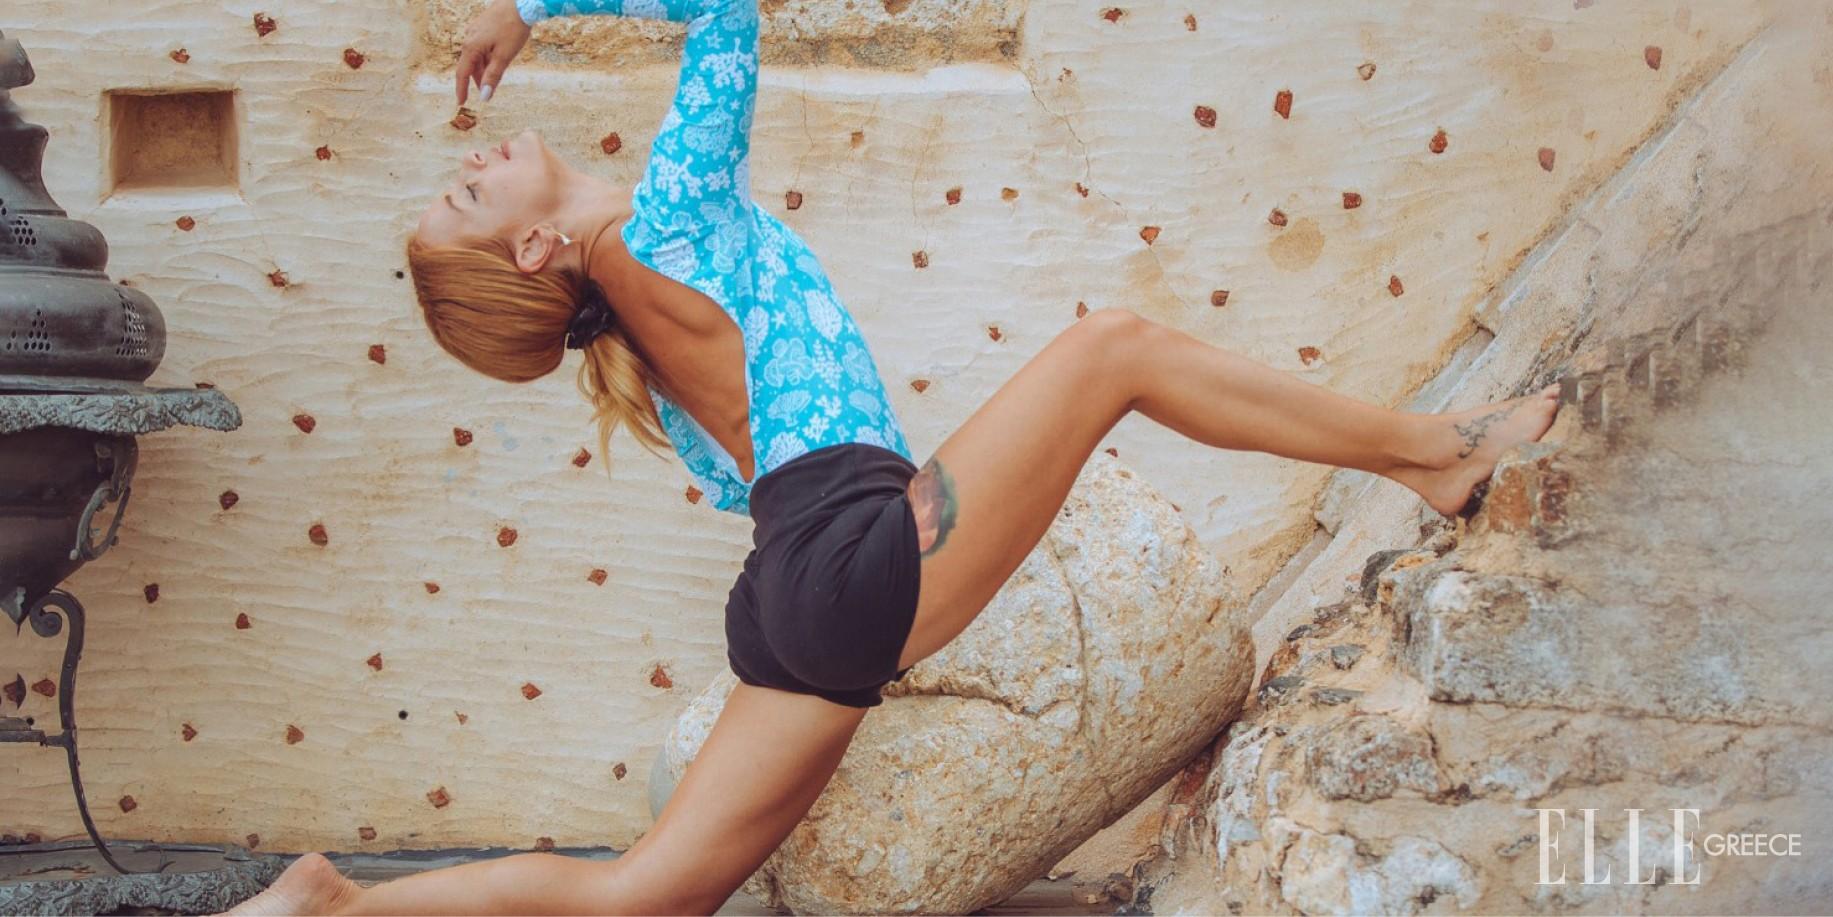 Let's talk Yoga: Η instructor Αλεξάνδρα Ρίζου μας βοηθά να εντάξουμε τη yoga στη ζωή μας